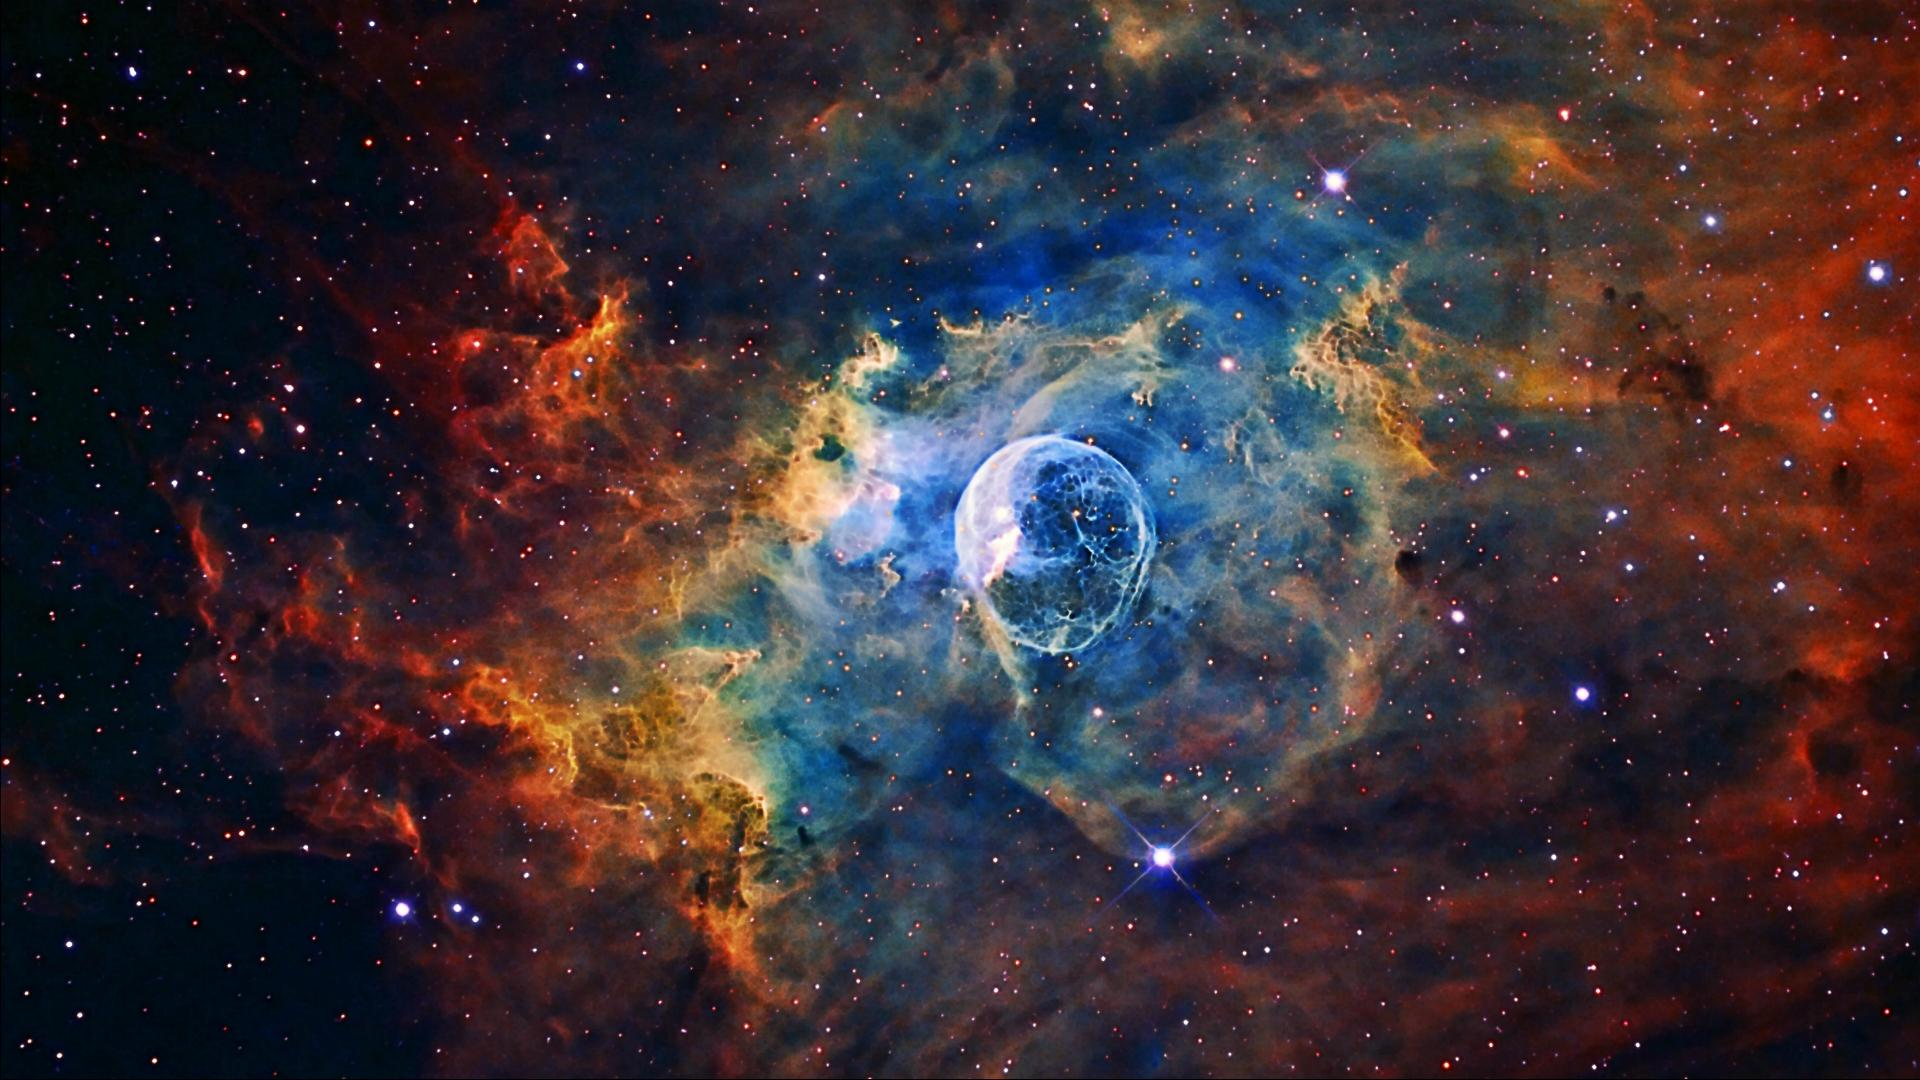 Hubble photographed the planetary nebula NGC 3918